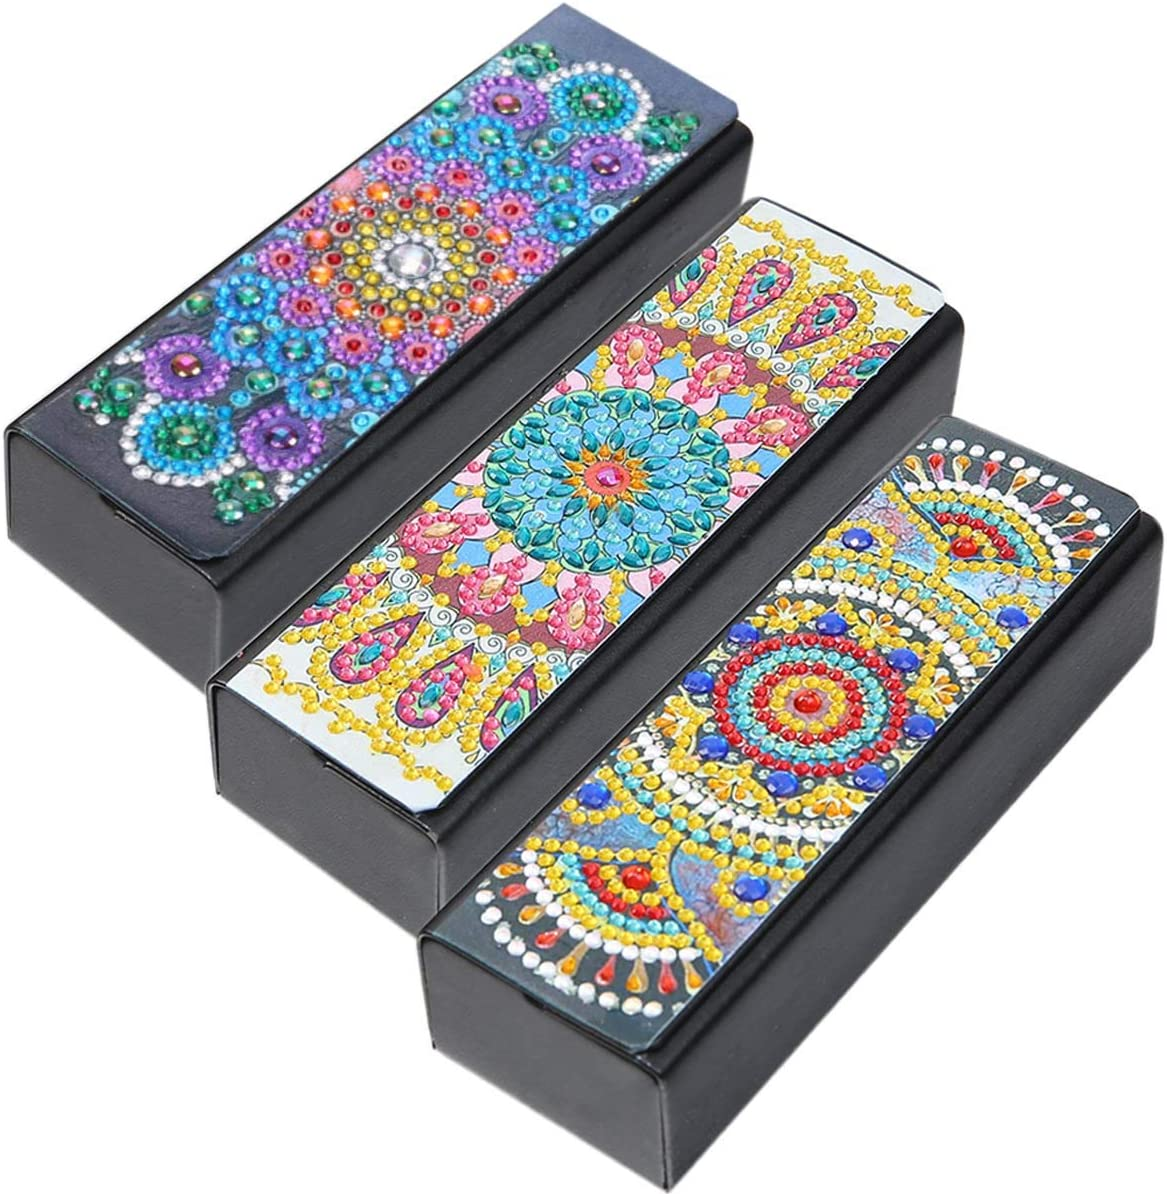 DIY Glasses Case Storage Box 5D Diamond Painting Mandala Alloyseed Leather Sunglasses Organizer for Festival Birthday Gift Handwork 3Pack